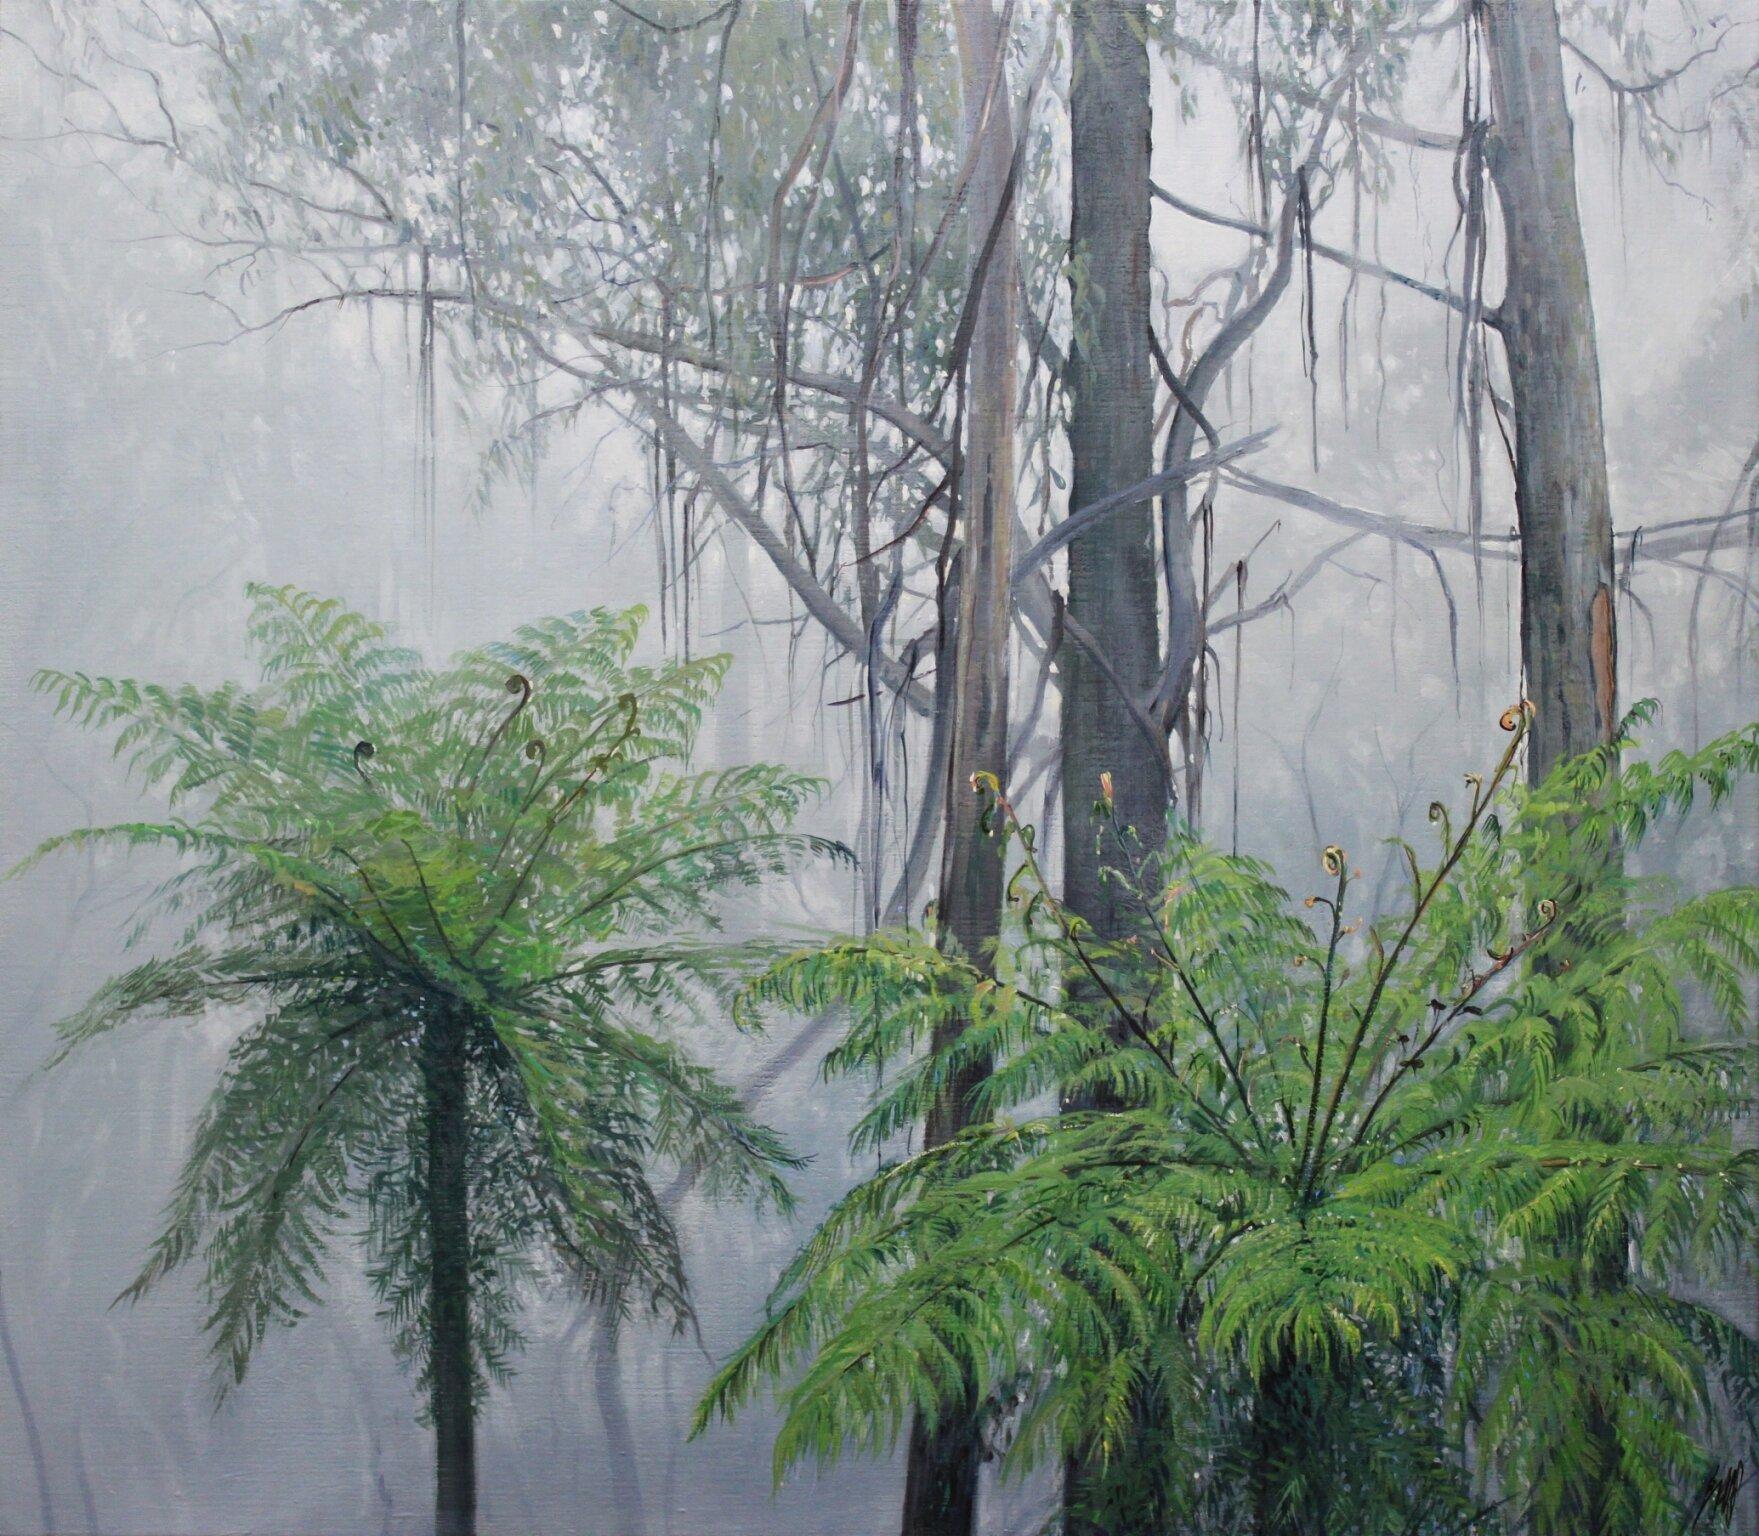 Paul EvansMisty Morning, 2019 Acrylic on Belgian Linen107 x 122 cm.jpg